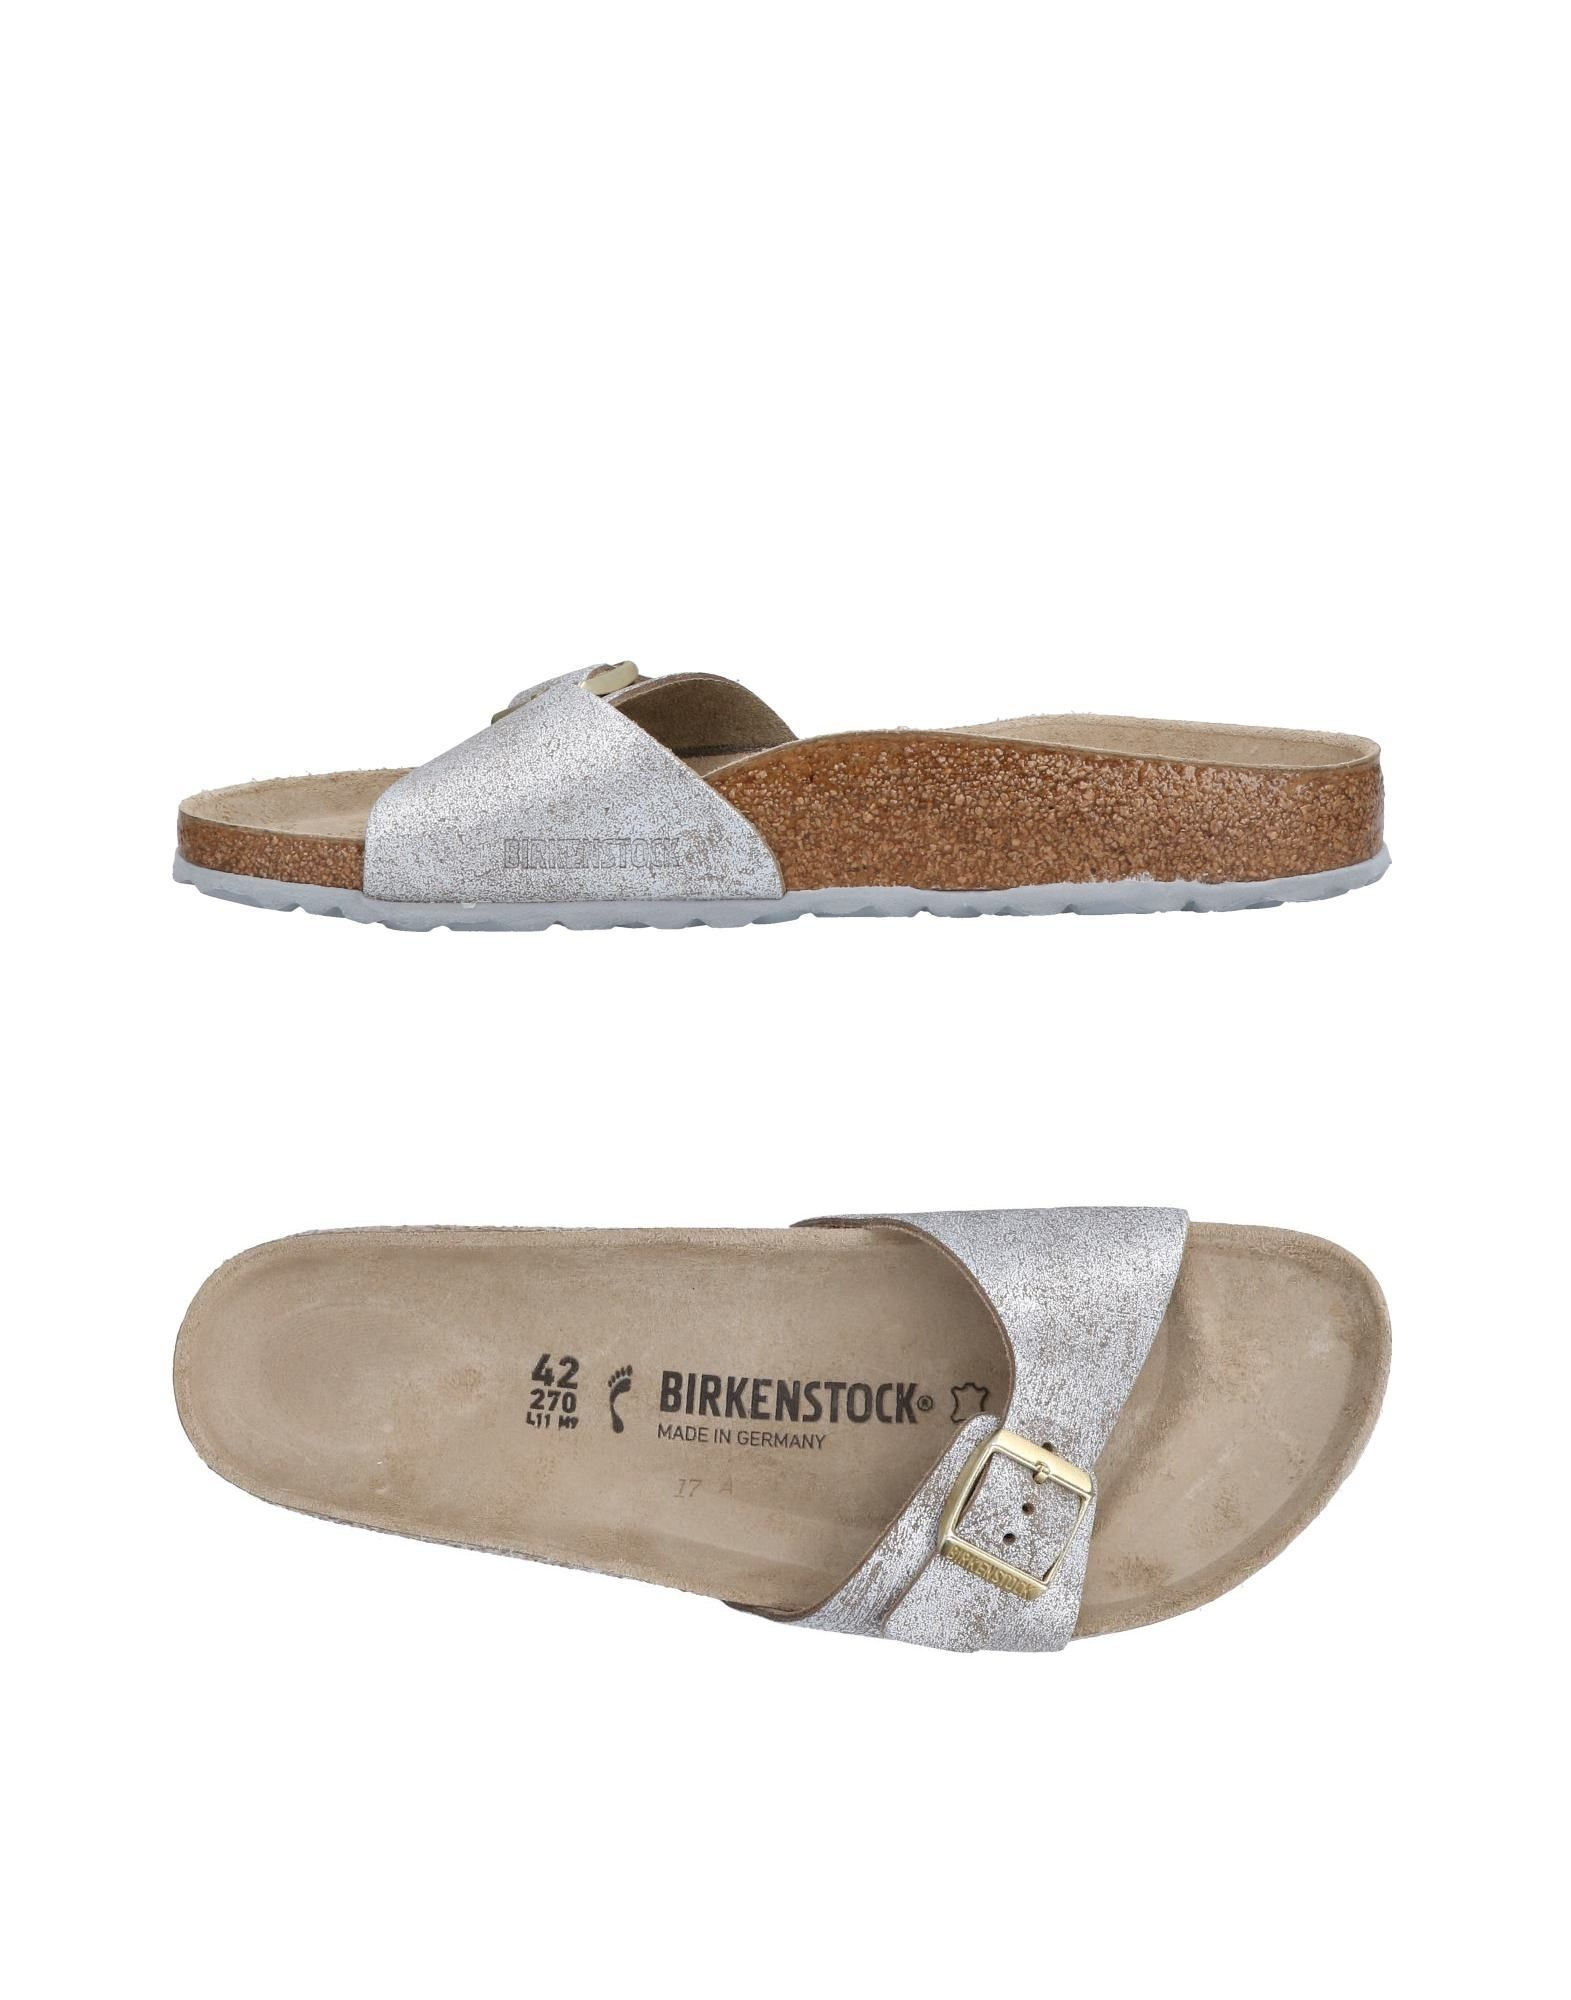 Birkenstock Sandals - Women  Birkenstock Sandals online on  Women Australia - 11471645QW caa28a